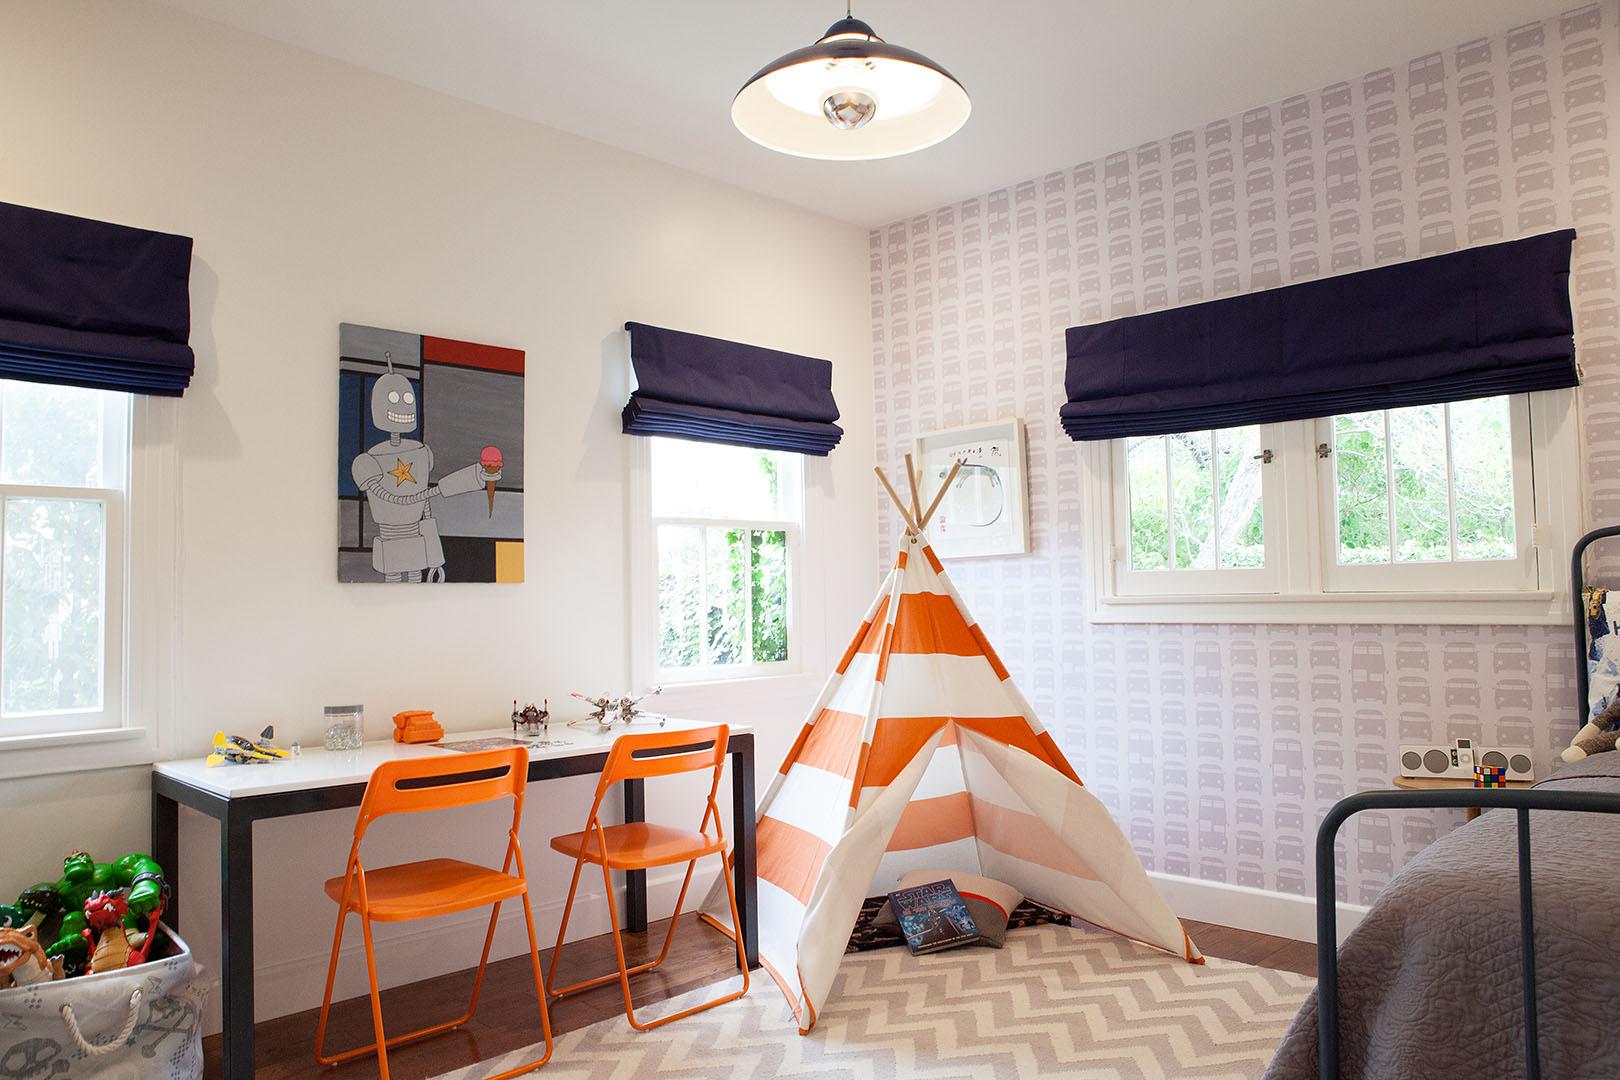 Children room interior design in Oakland, CA